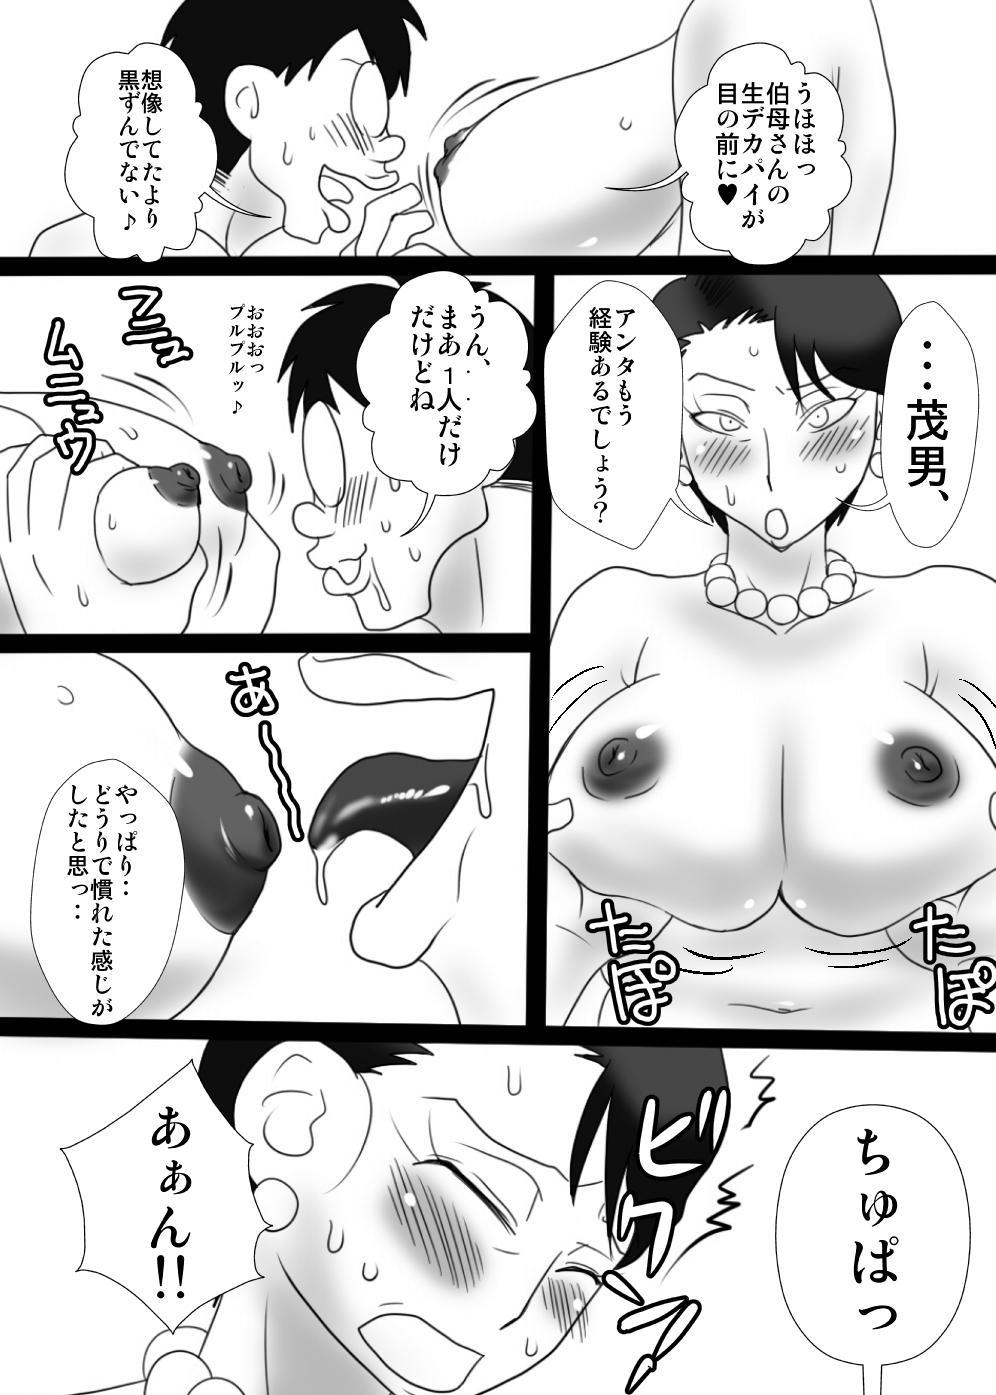 Oba-san o Otosuze! 17